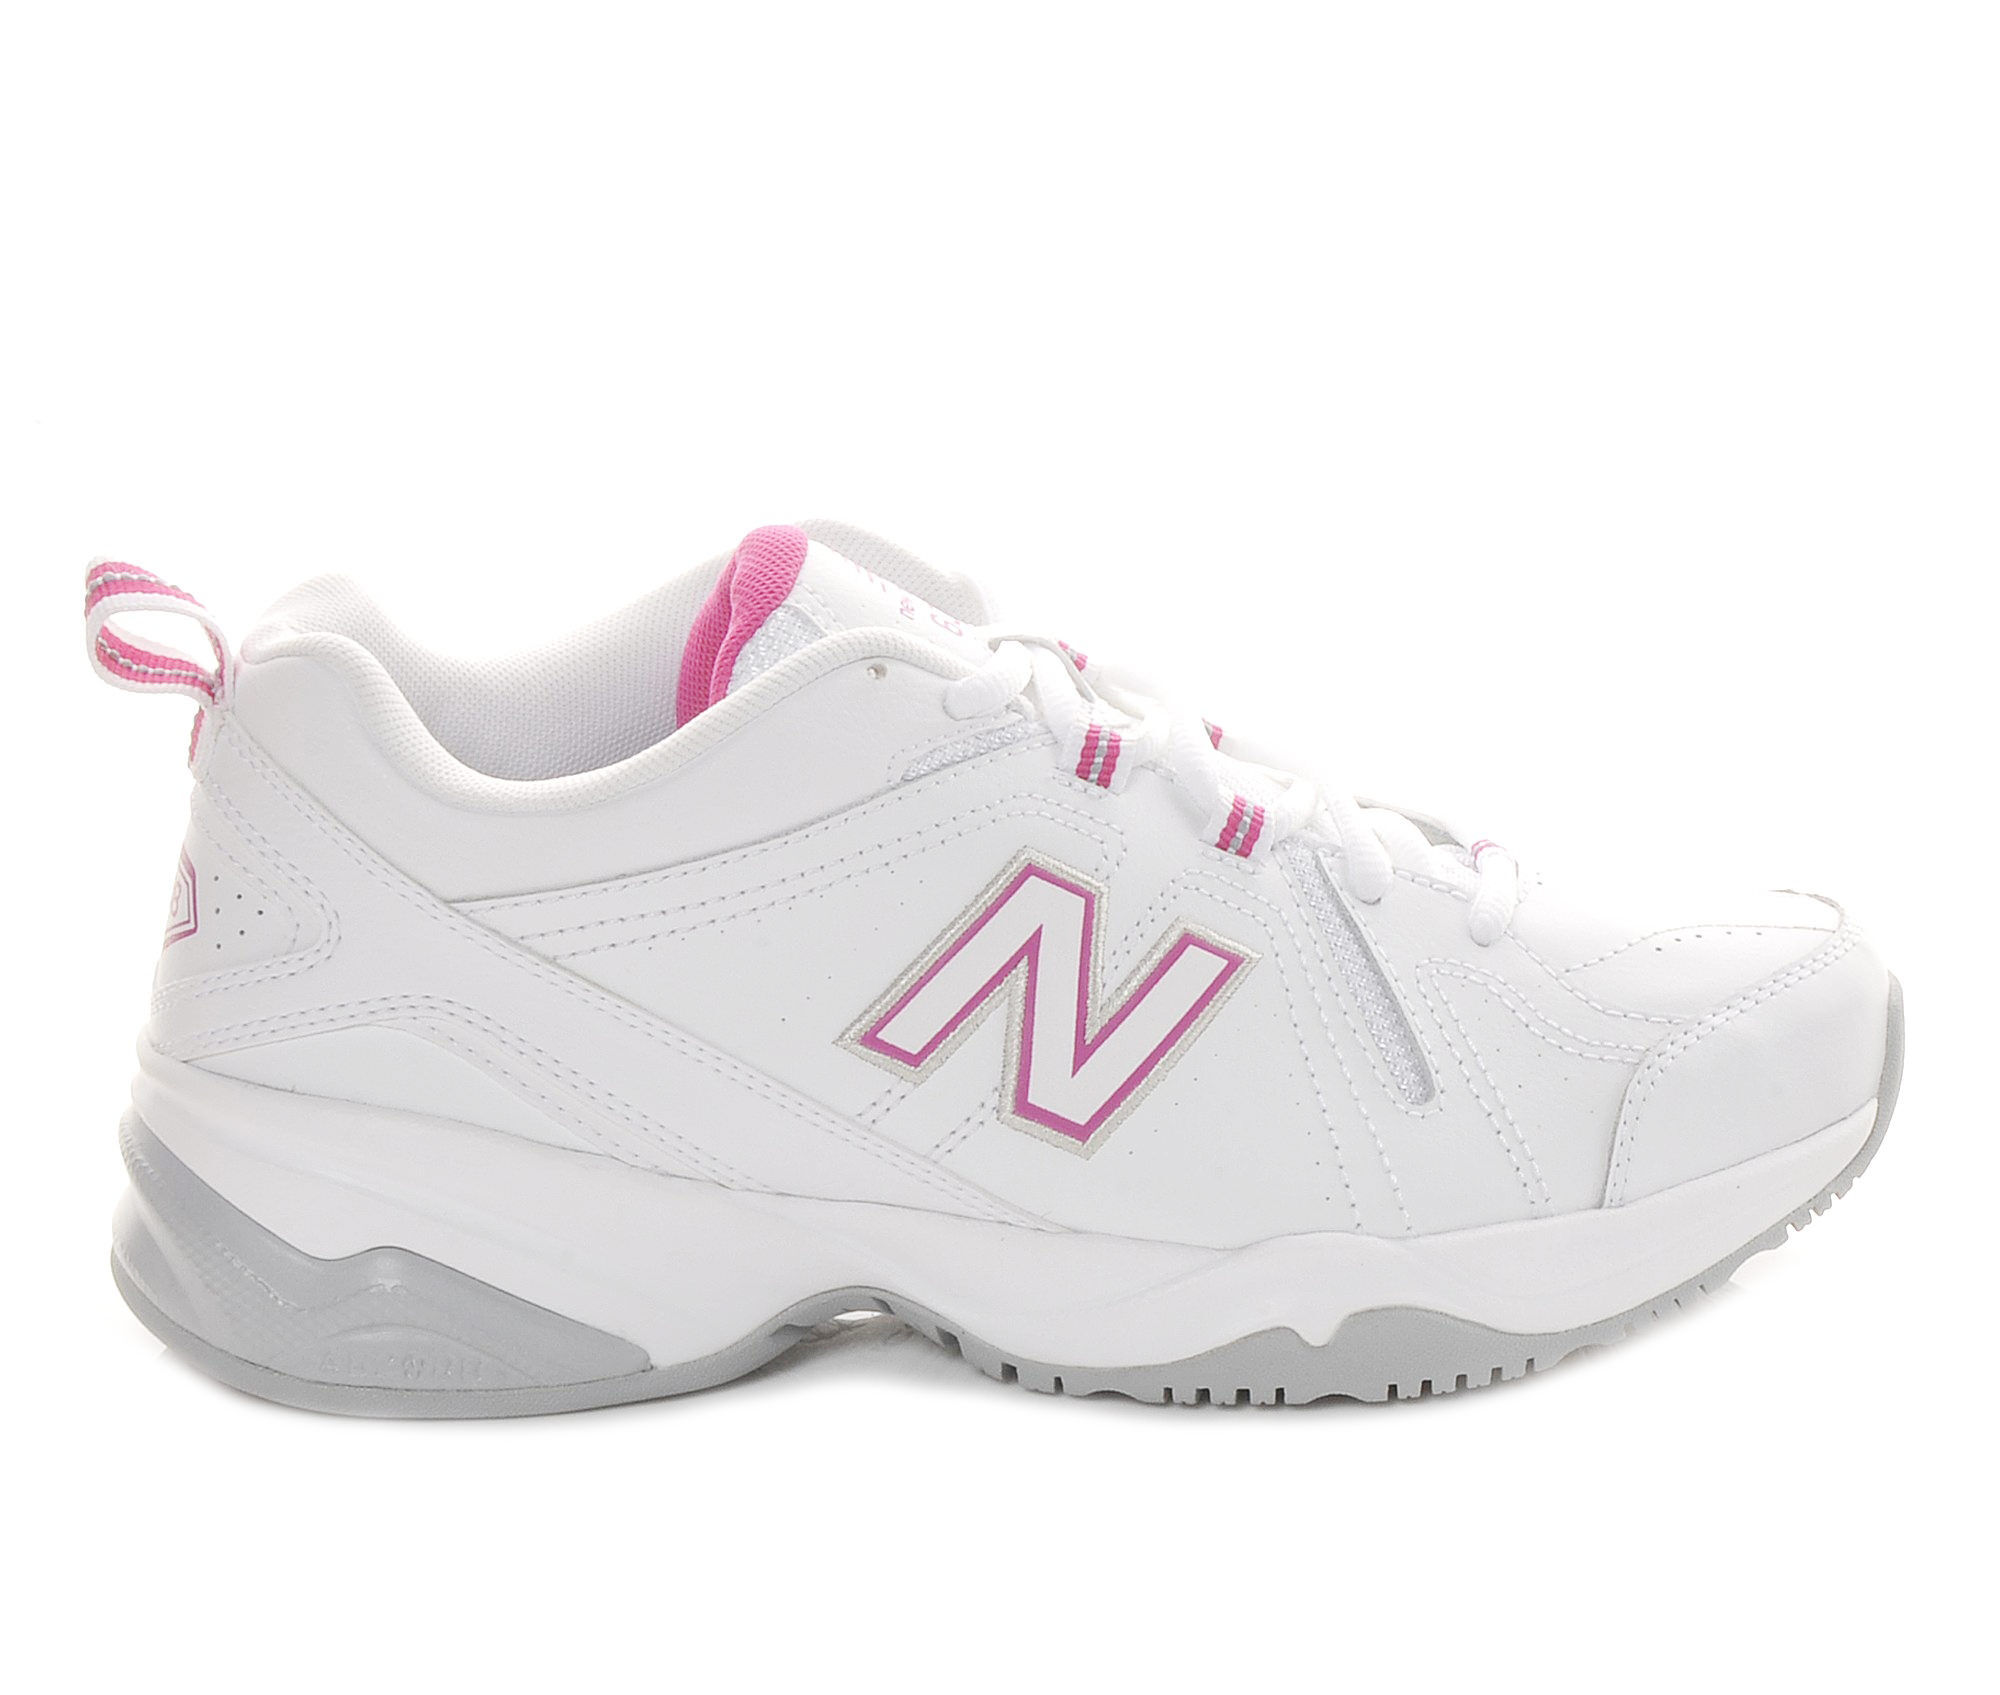 Women's New Balance WX608V4 Training Shoes White/Pink